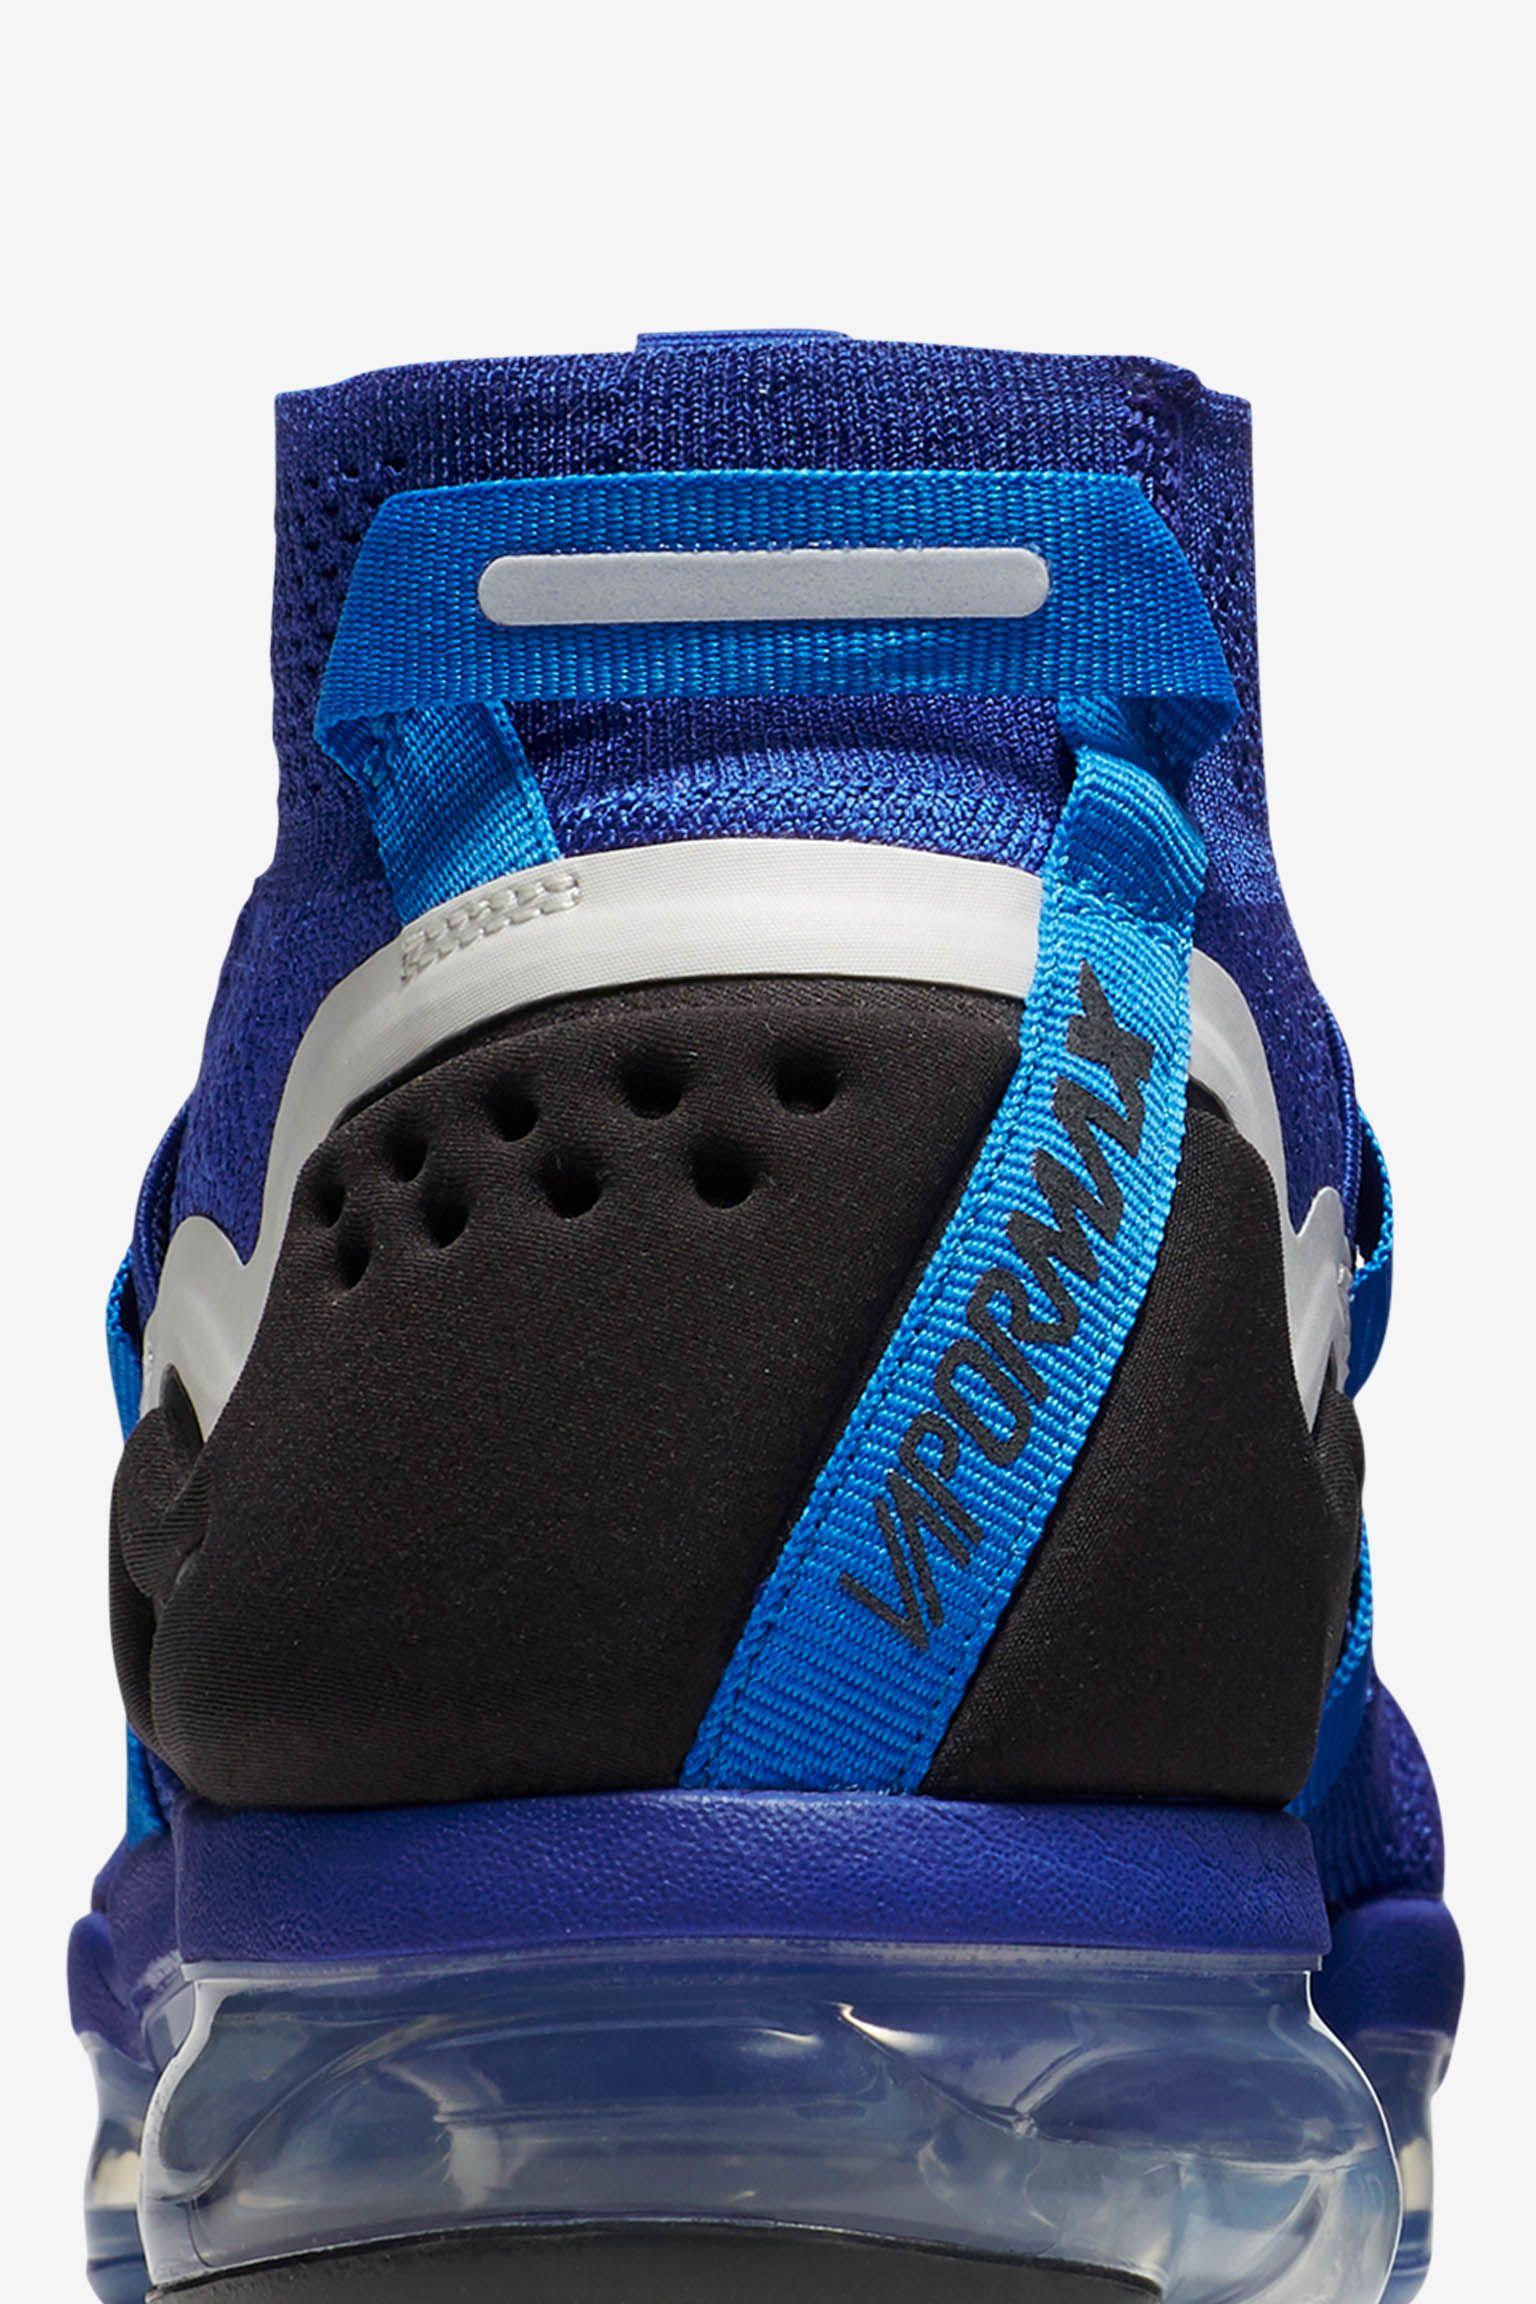 Nike Air Vapormax Utility 'Game Royal & Black' Release Date